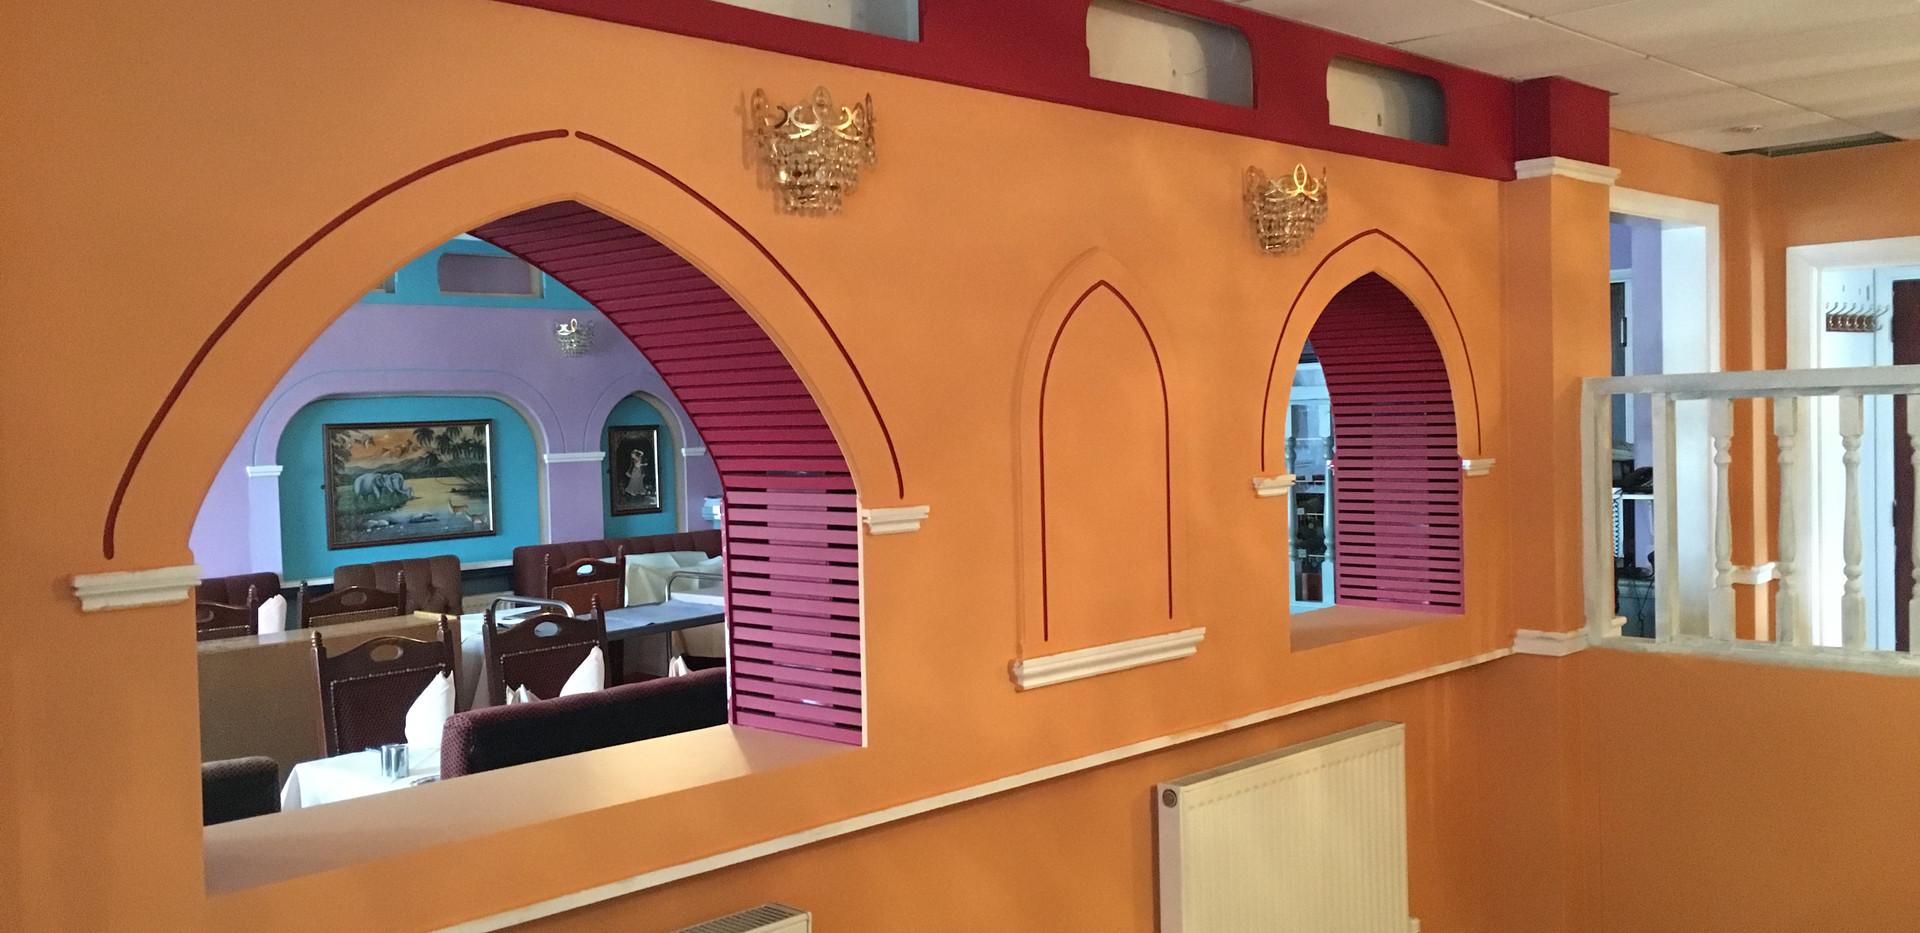 Indian Restaurant Refurbishment